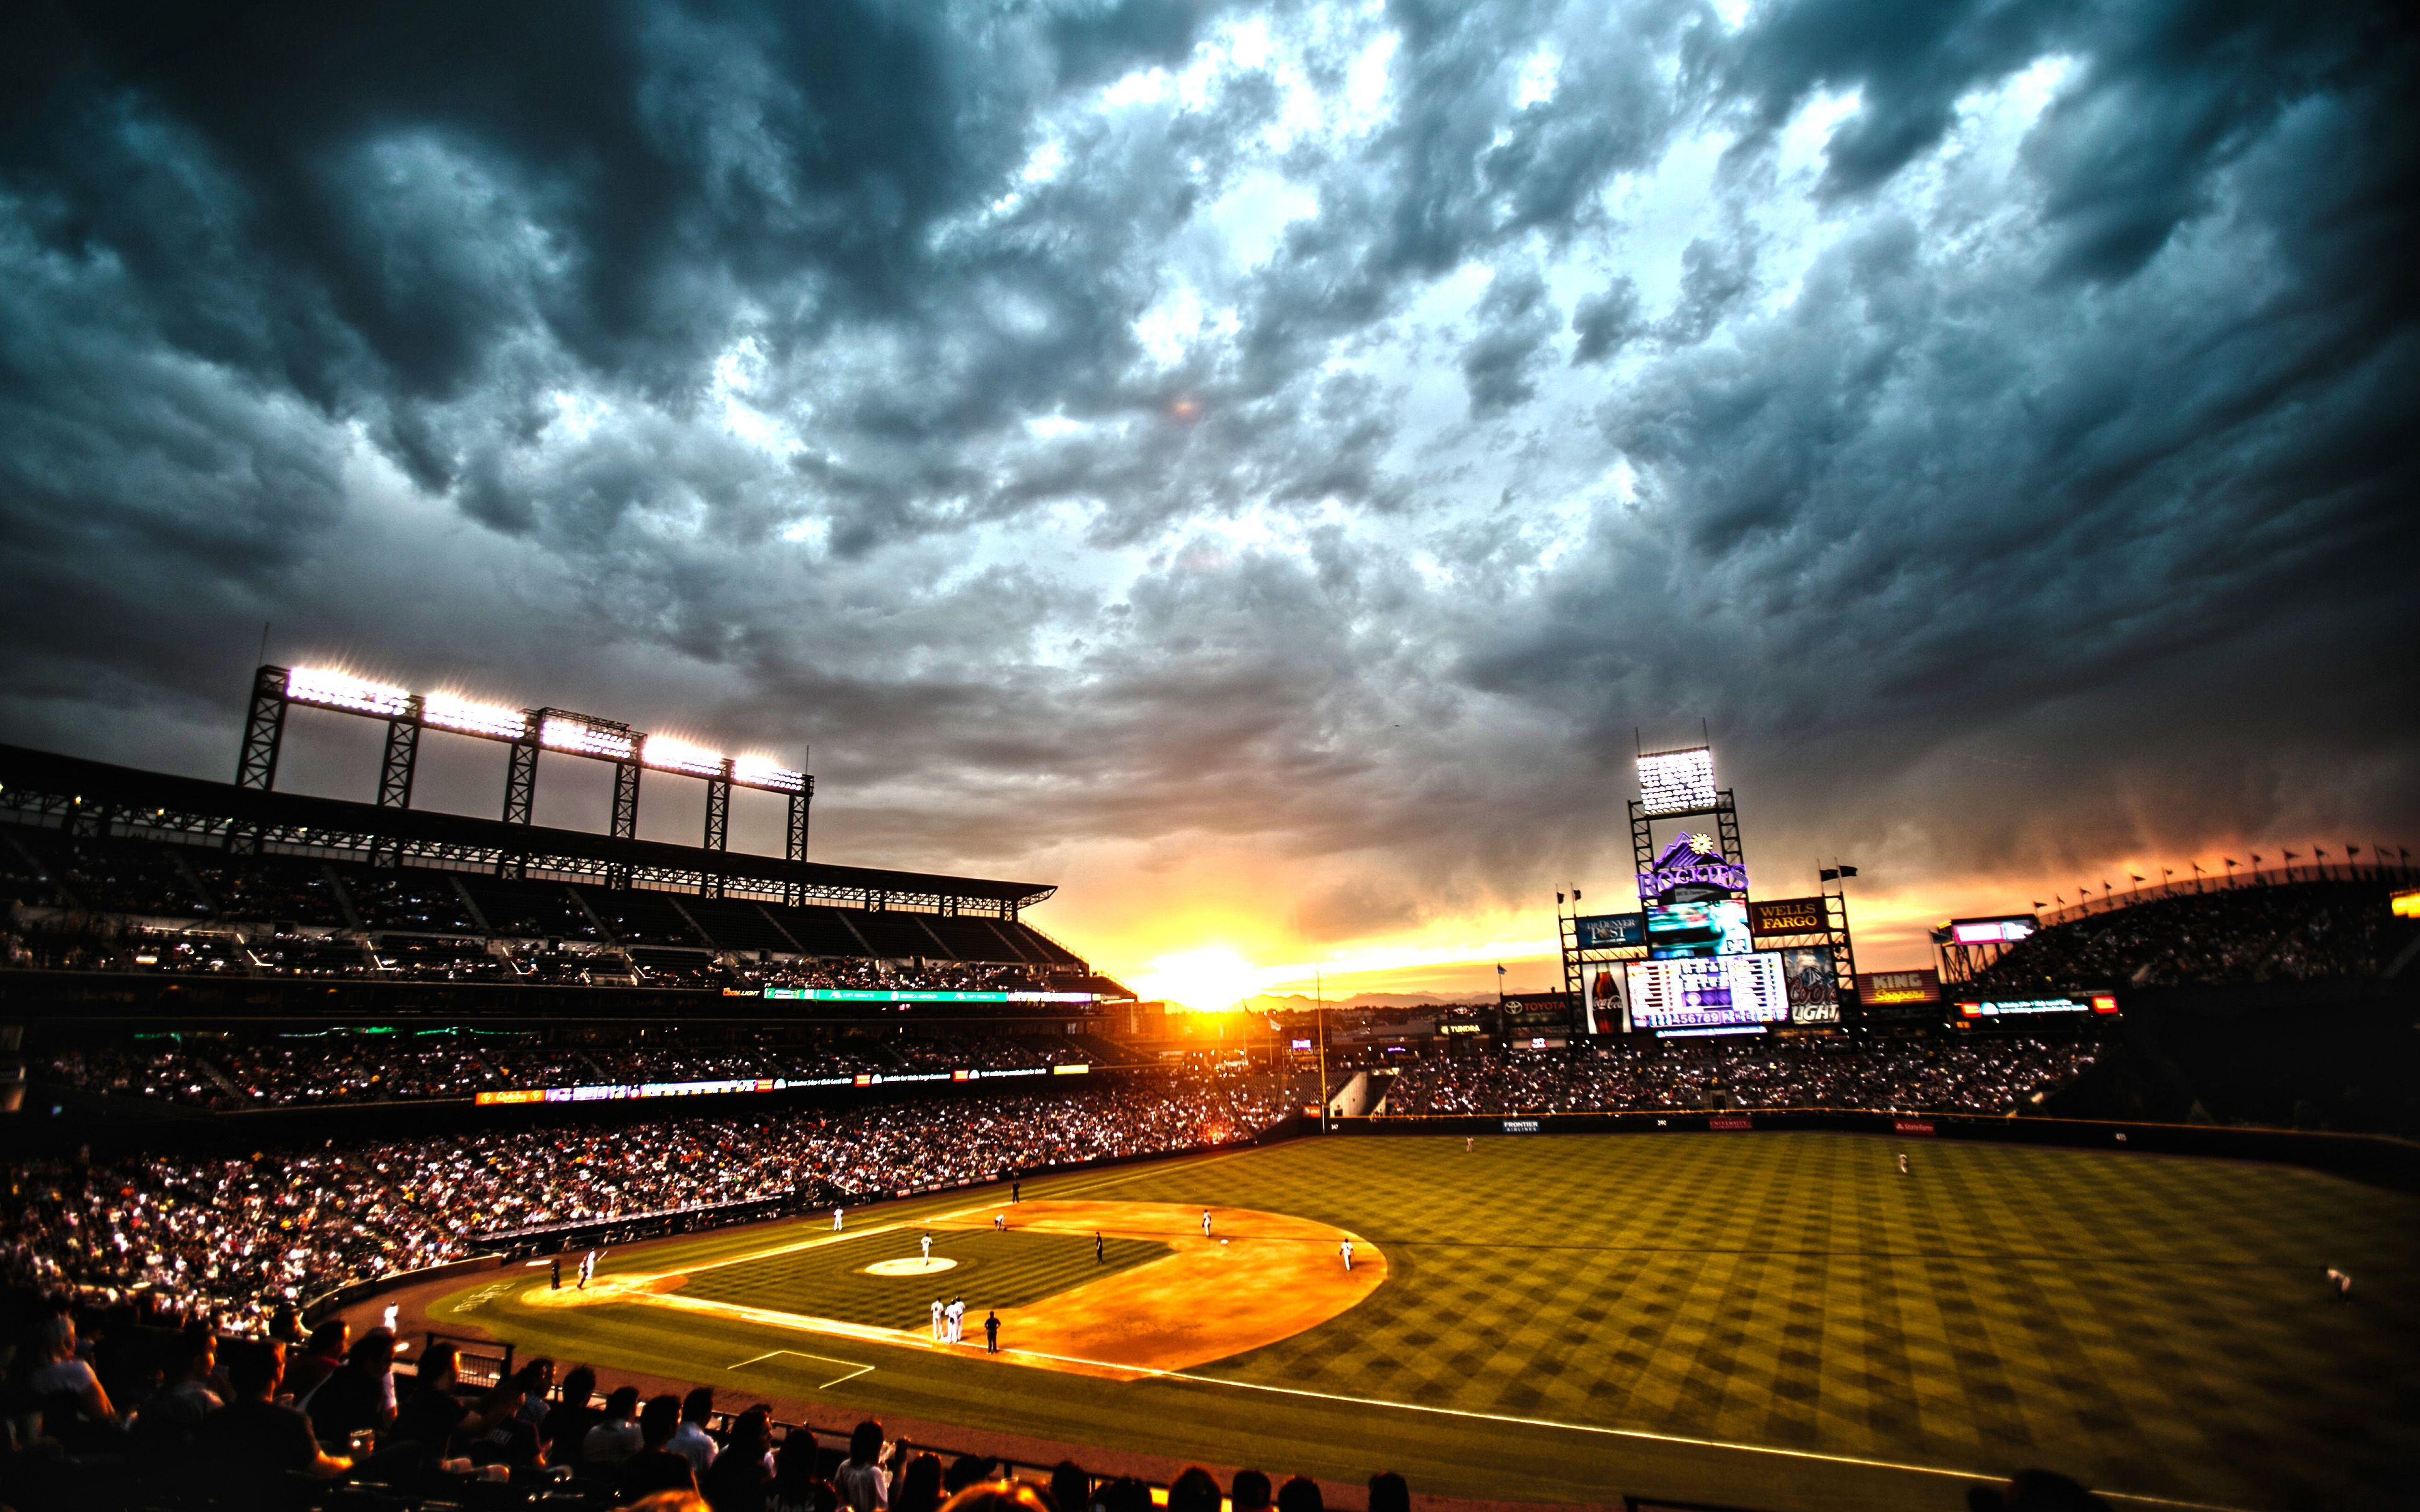 Baseball wallpapers buscar con google deportes favoritos baseball wallpapers buscar con google voltagebd Image collections